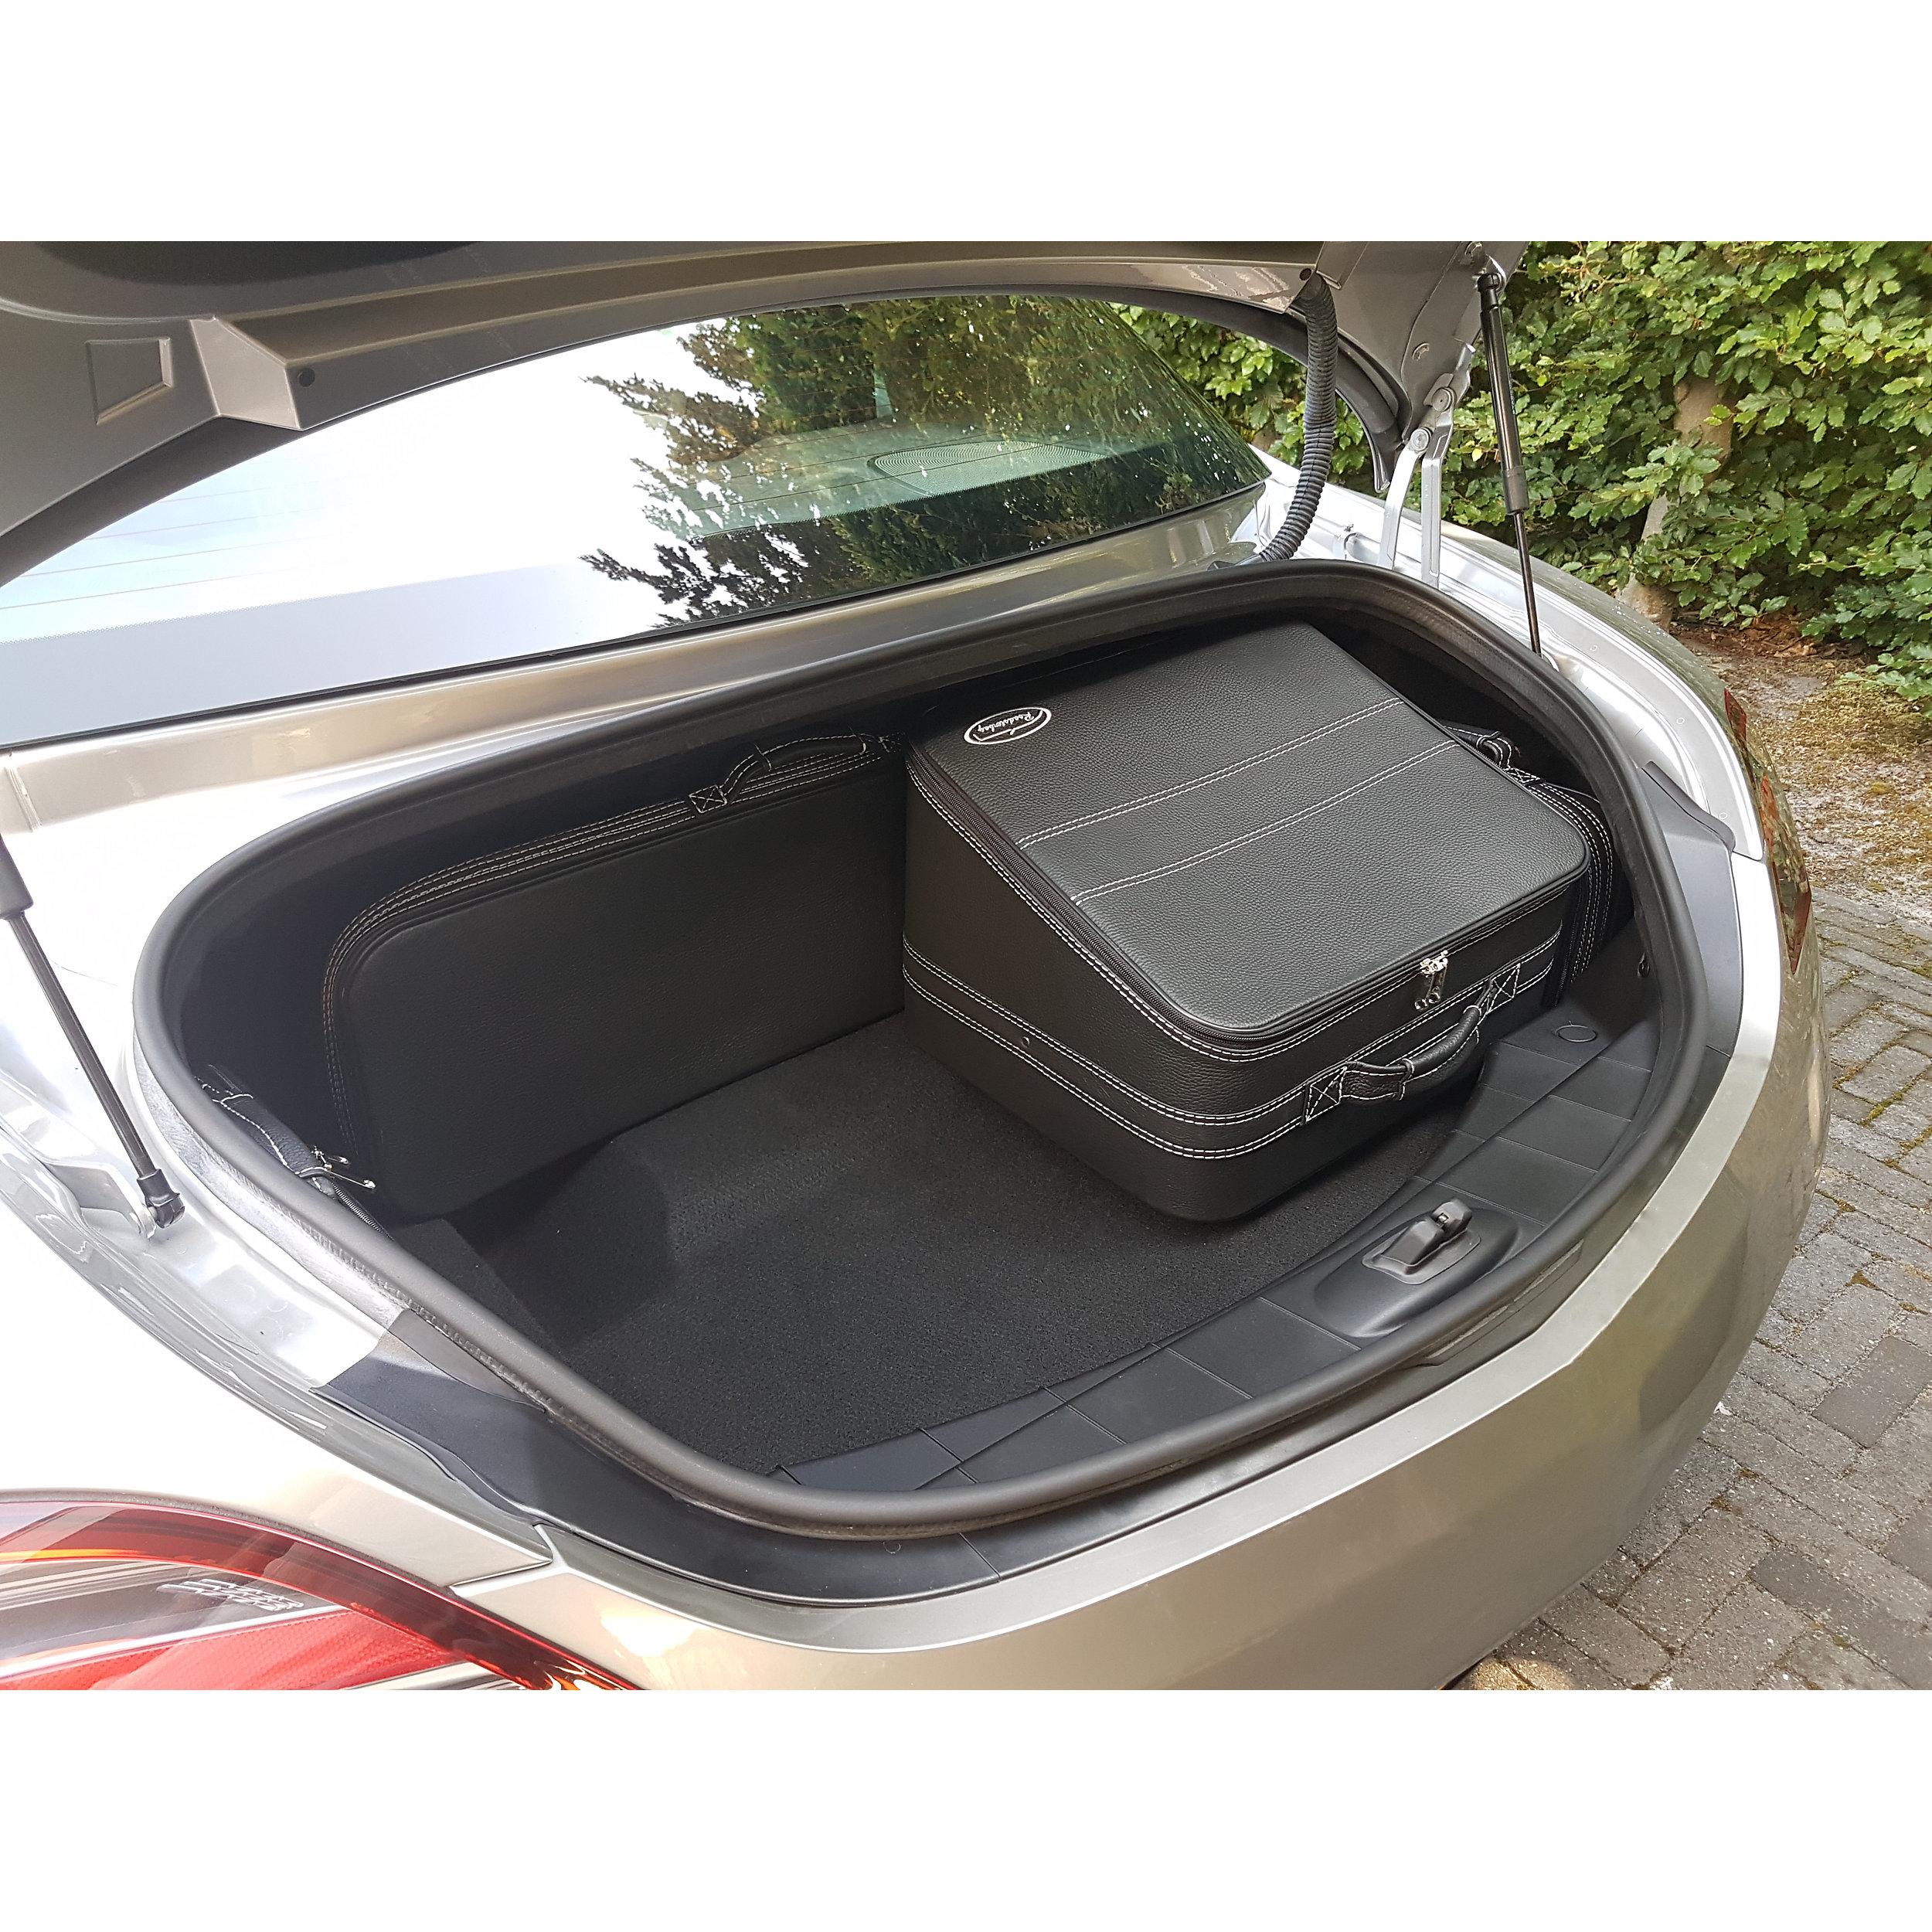 5-tlg. Kofferset Mercedes AMG SLS Coupé/Flügeltürer